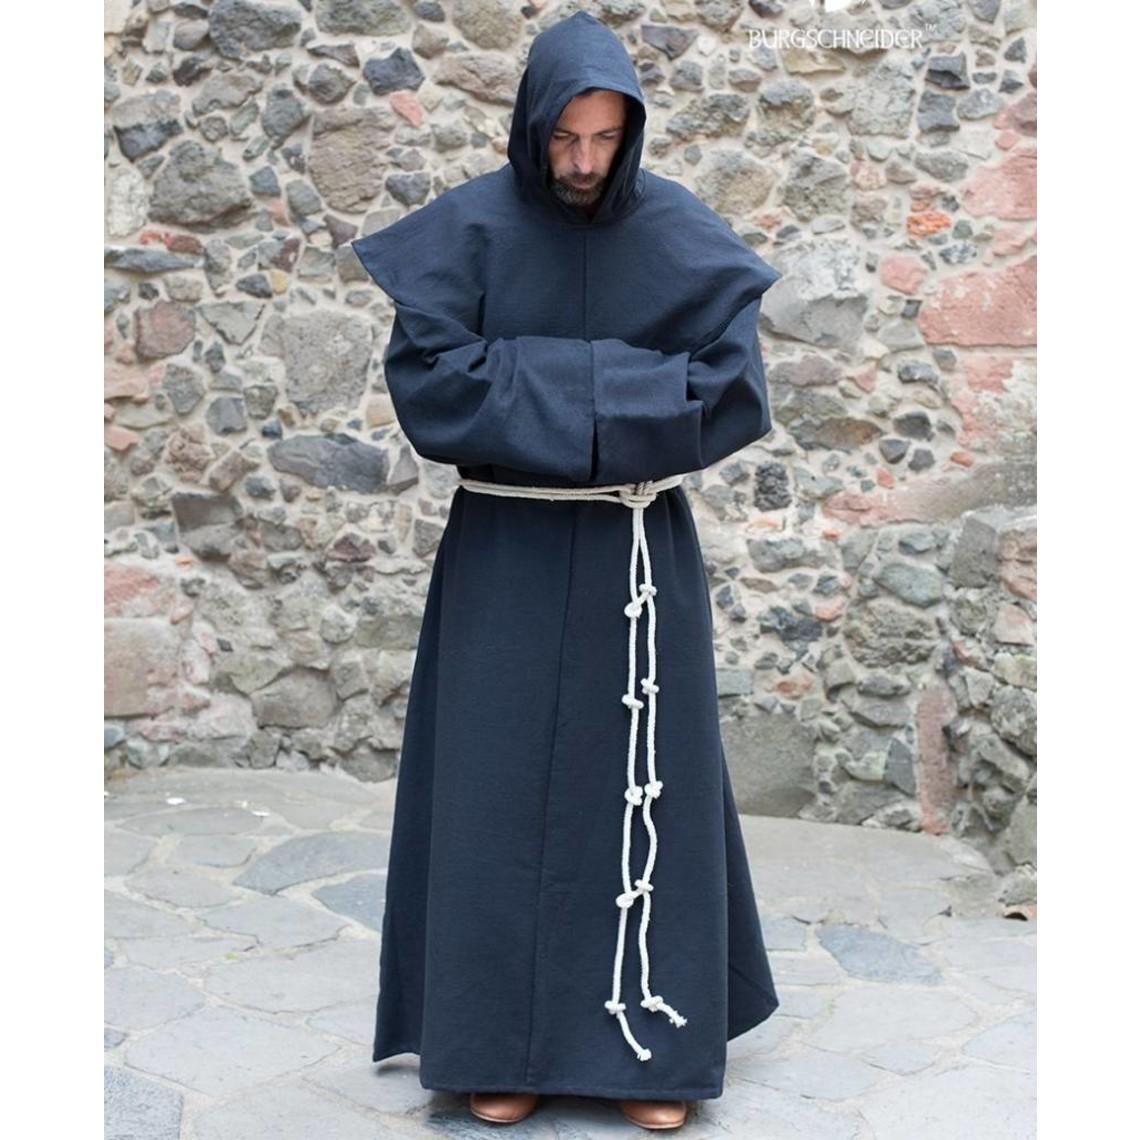 Burgschneider Benedictijnse habijt monnikspij, zwart